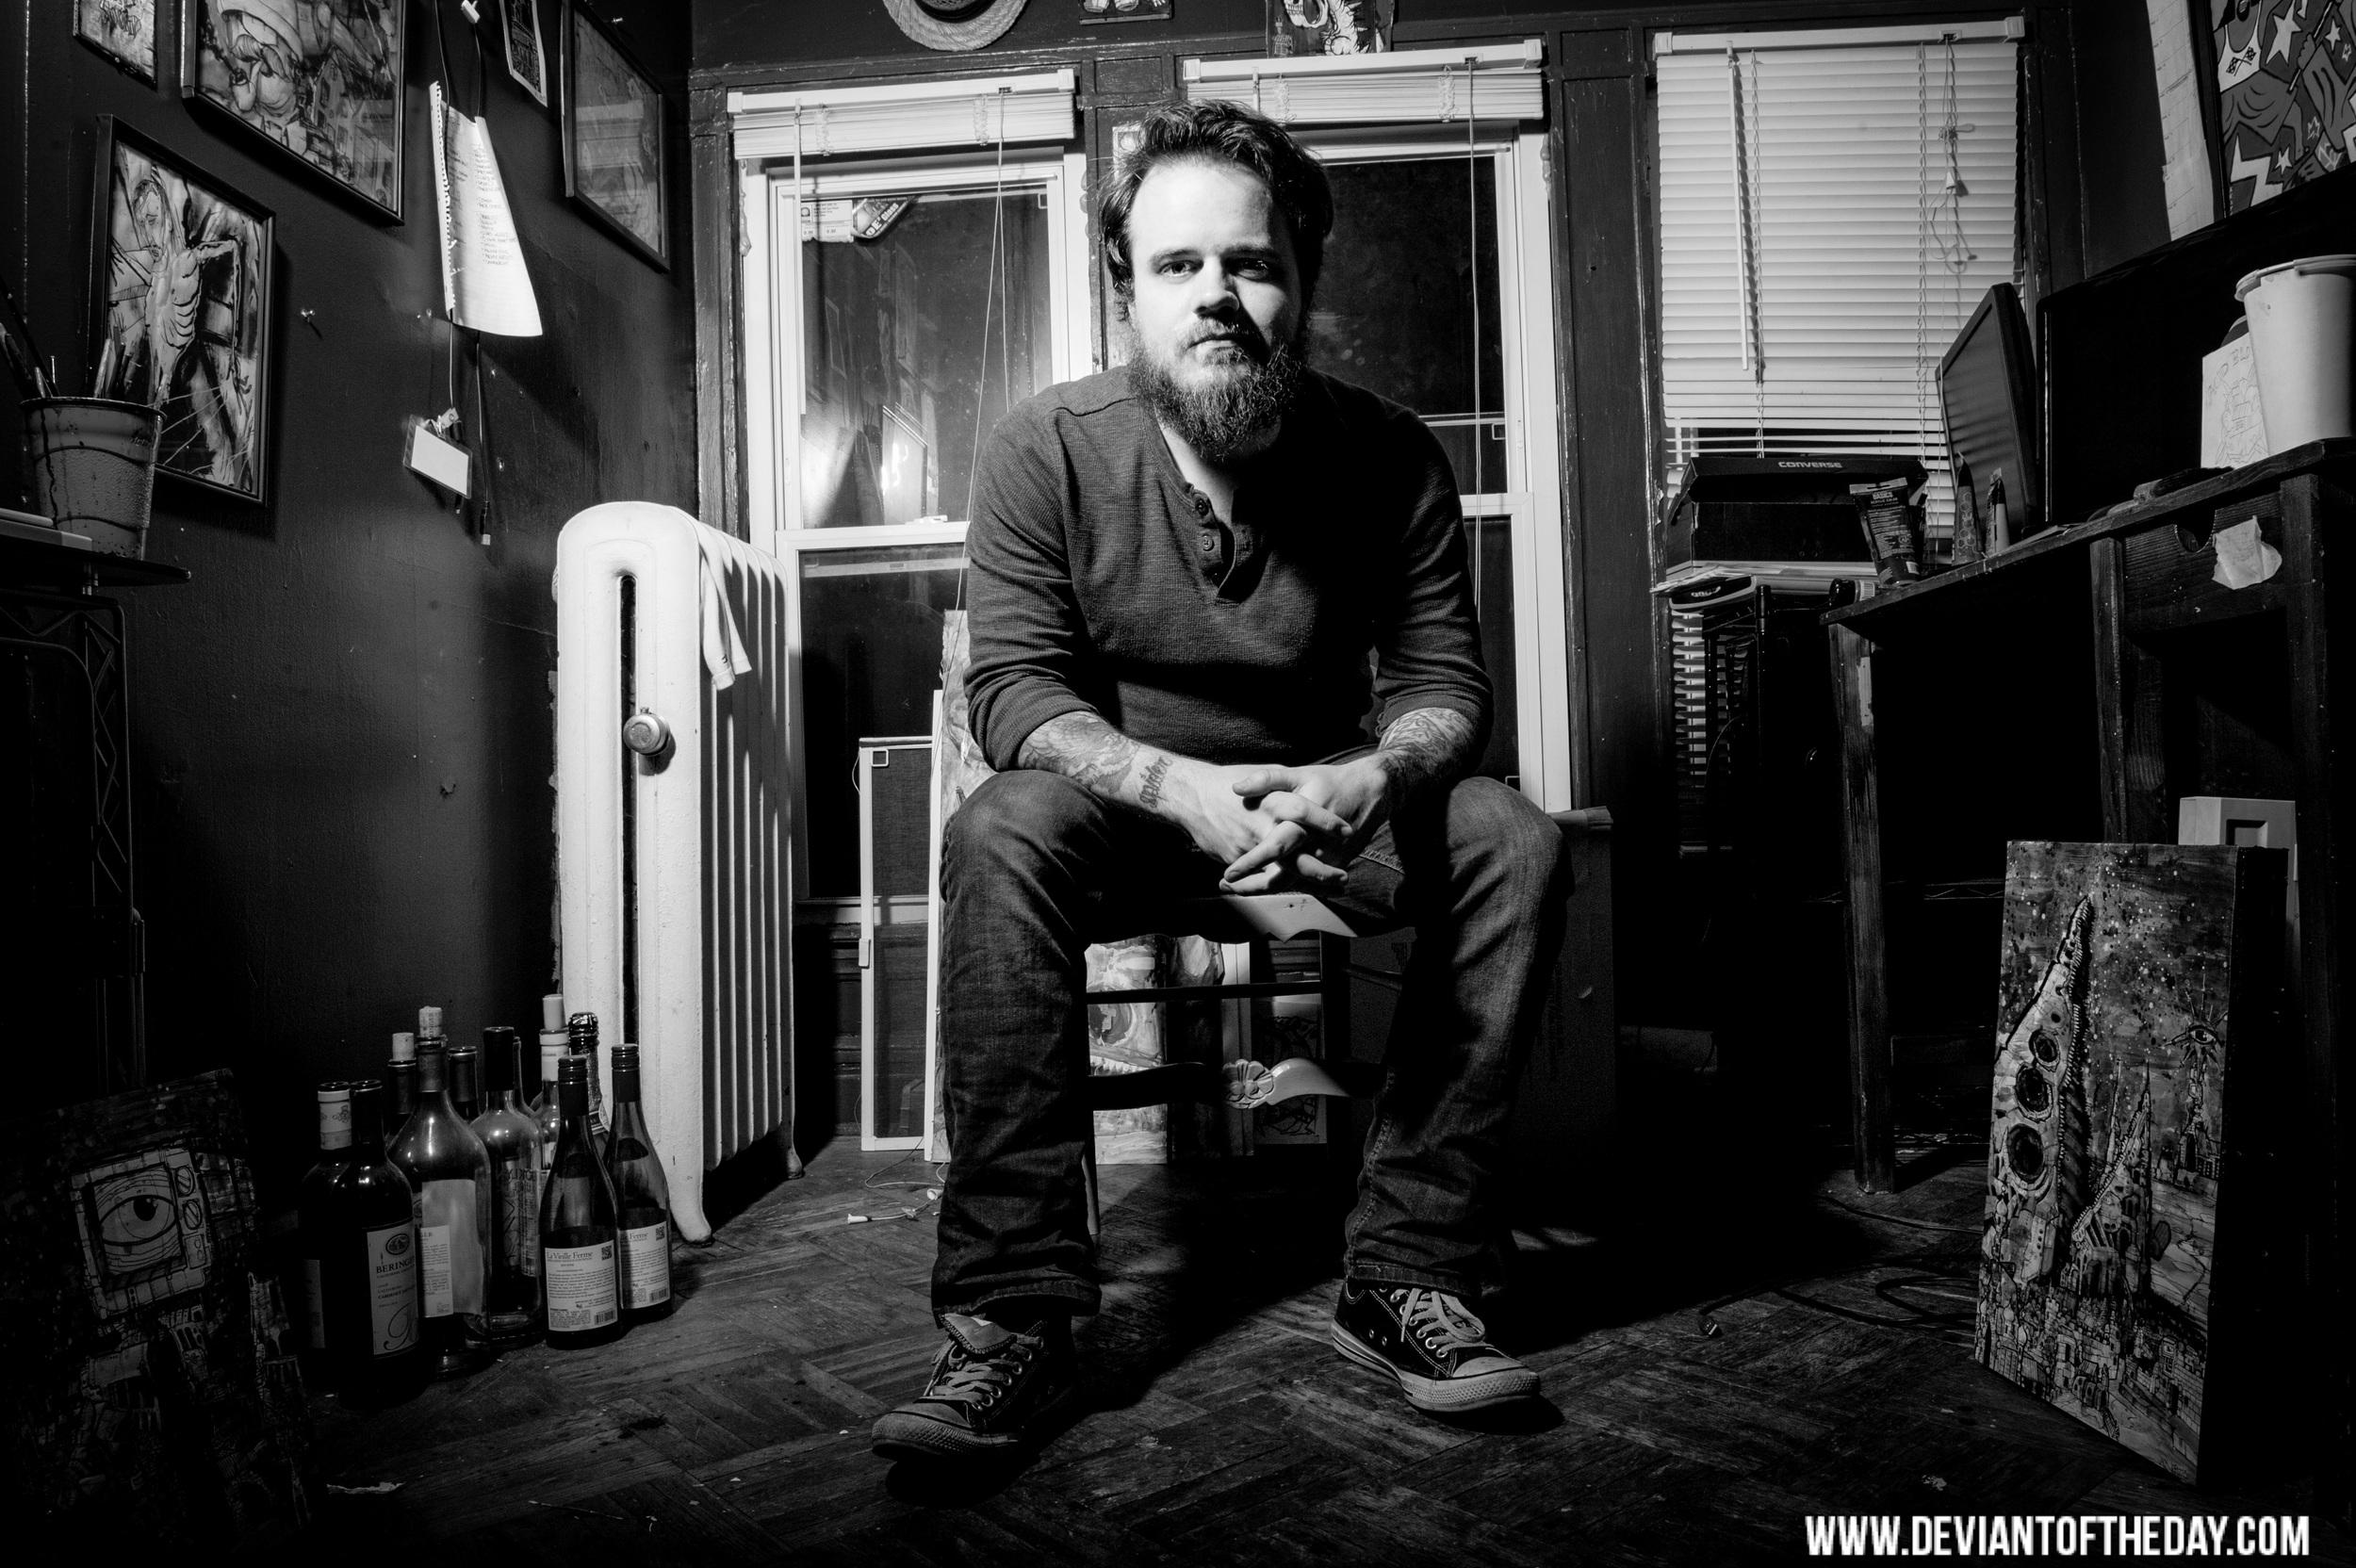 jonathan-mcphail-photography-bk-portraits-headshots-deviant-day-jack-jerz-4.jpg